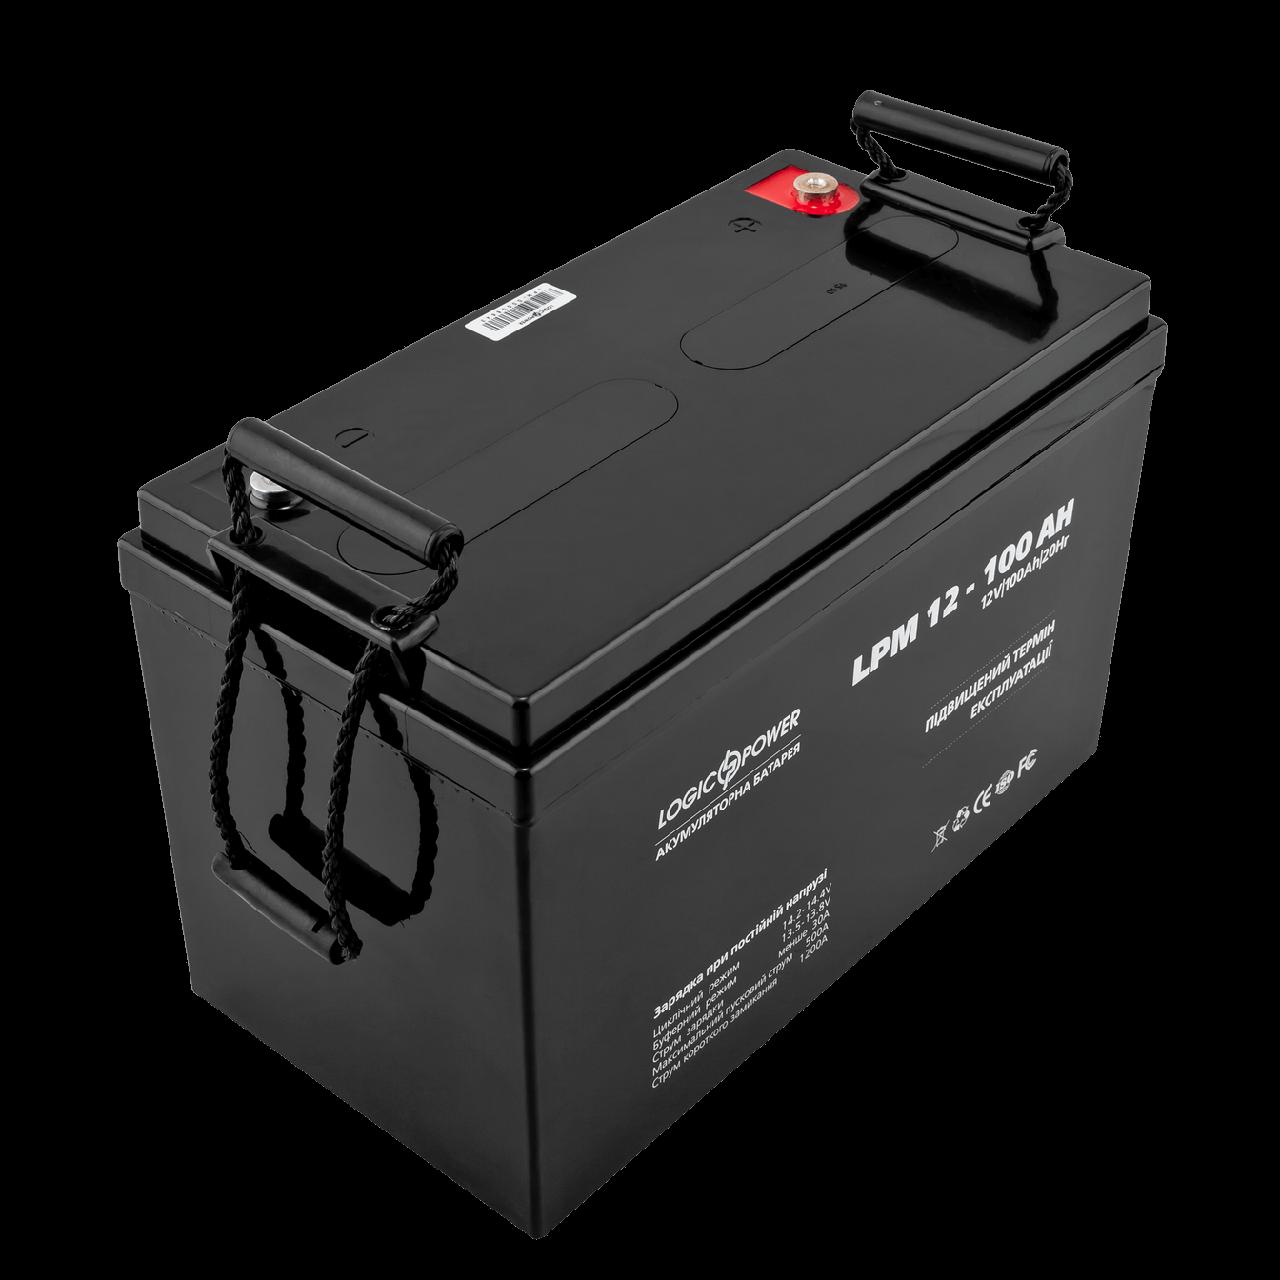 Аккумулятор LPM 12 - 100 AH